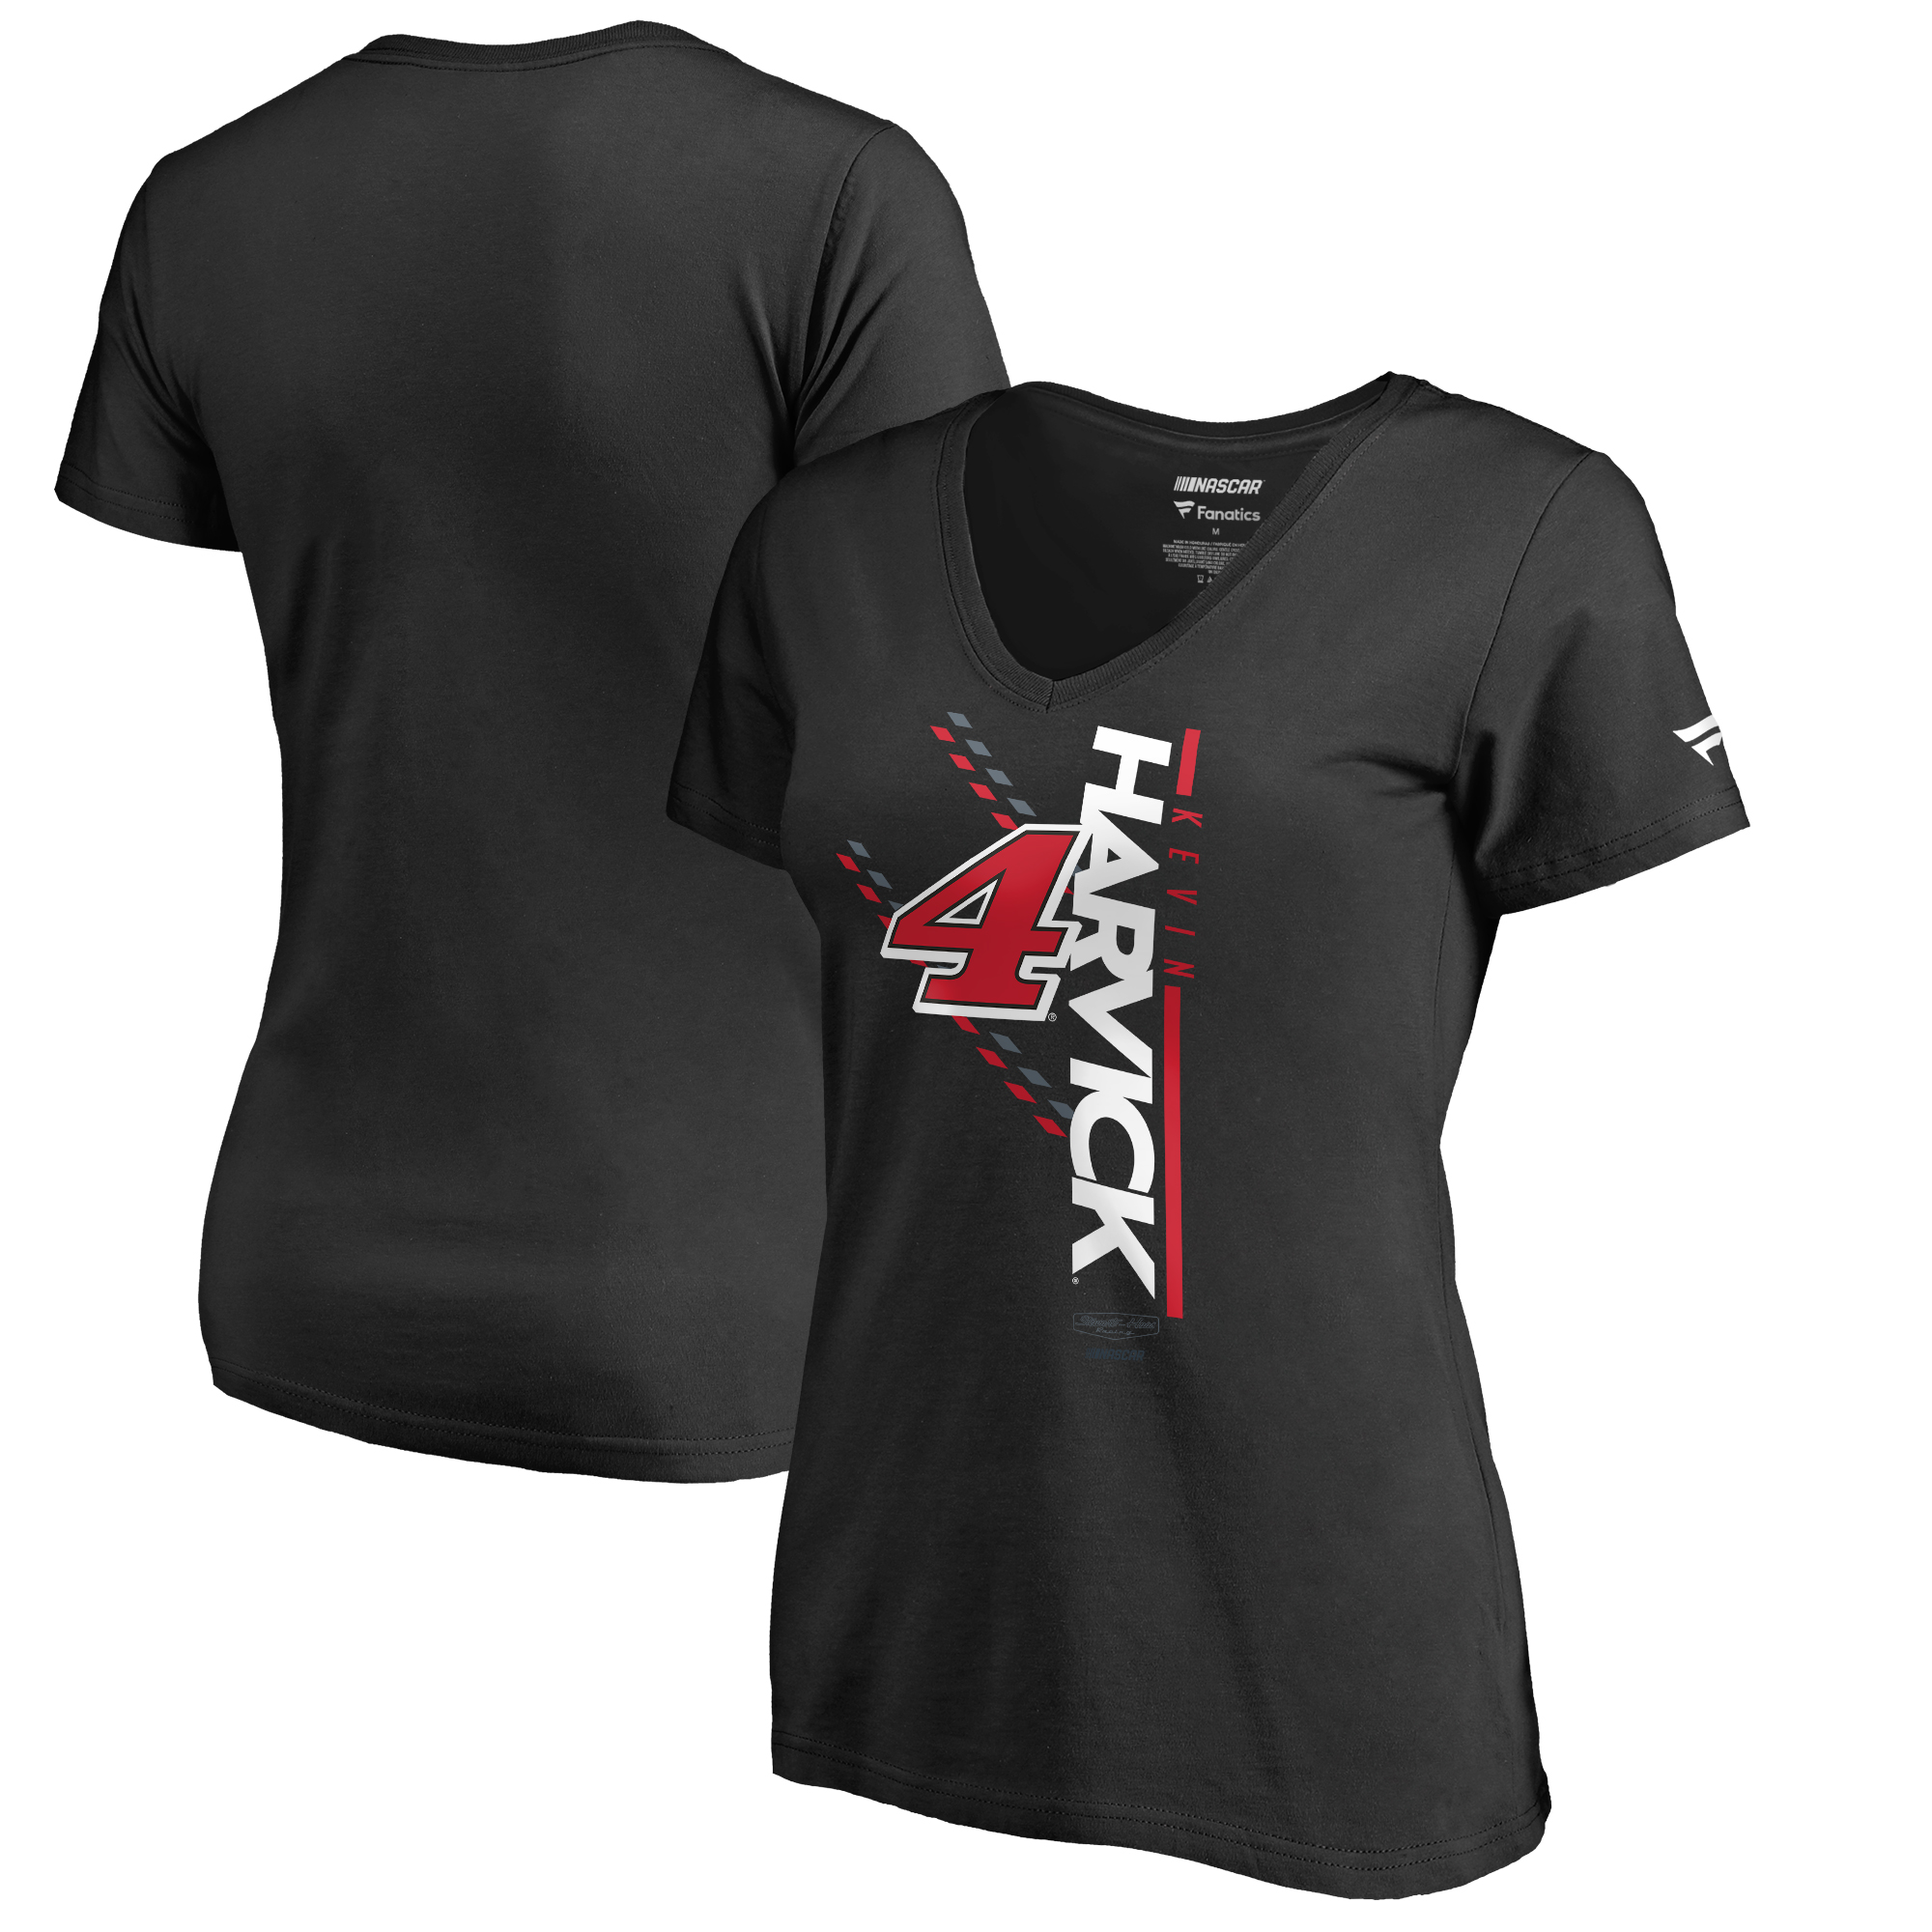 Kevin Harvick Fanatics Branded Women's NASCAR Track Bar V-Neck T-Shirt - Black